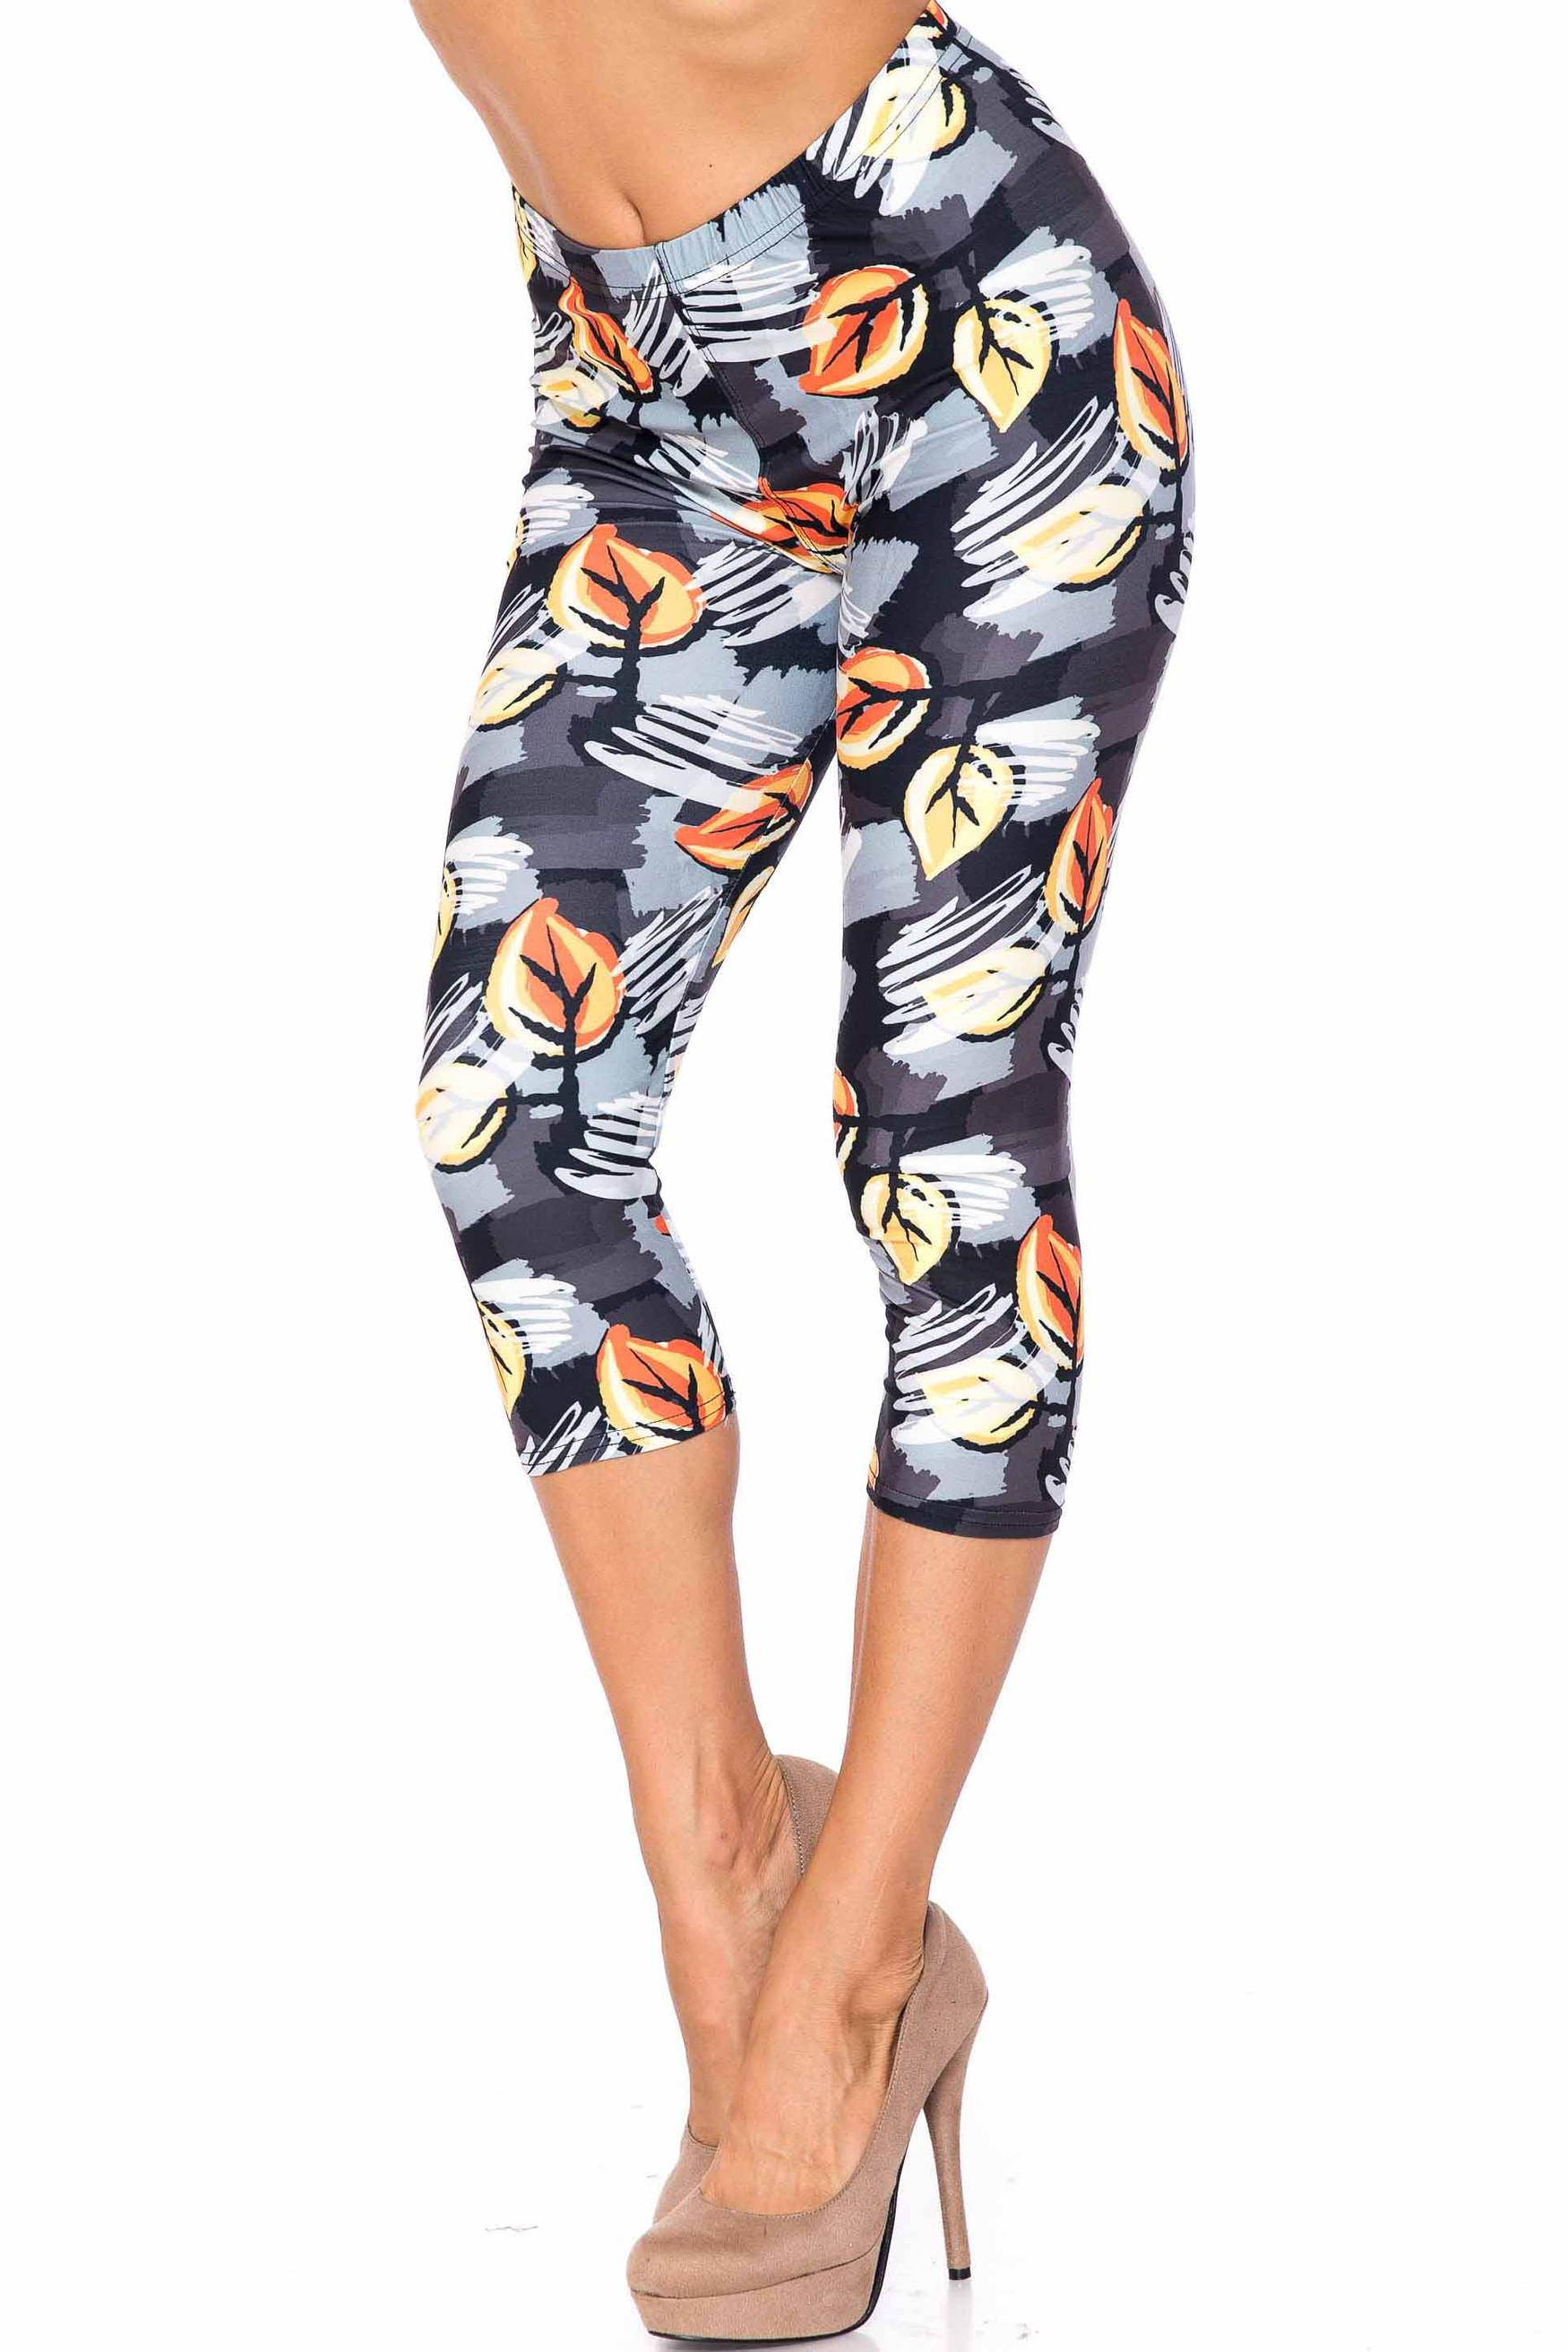 Creamy Soft Orange Leaf Breeze Capris - USA Fashion™